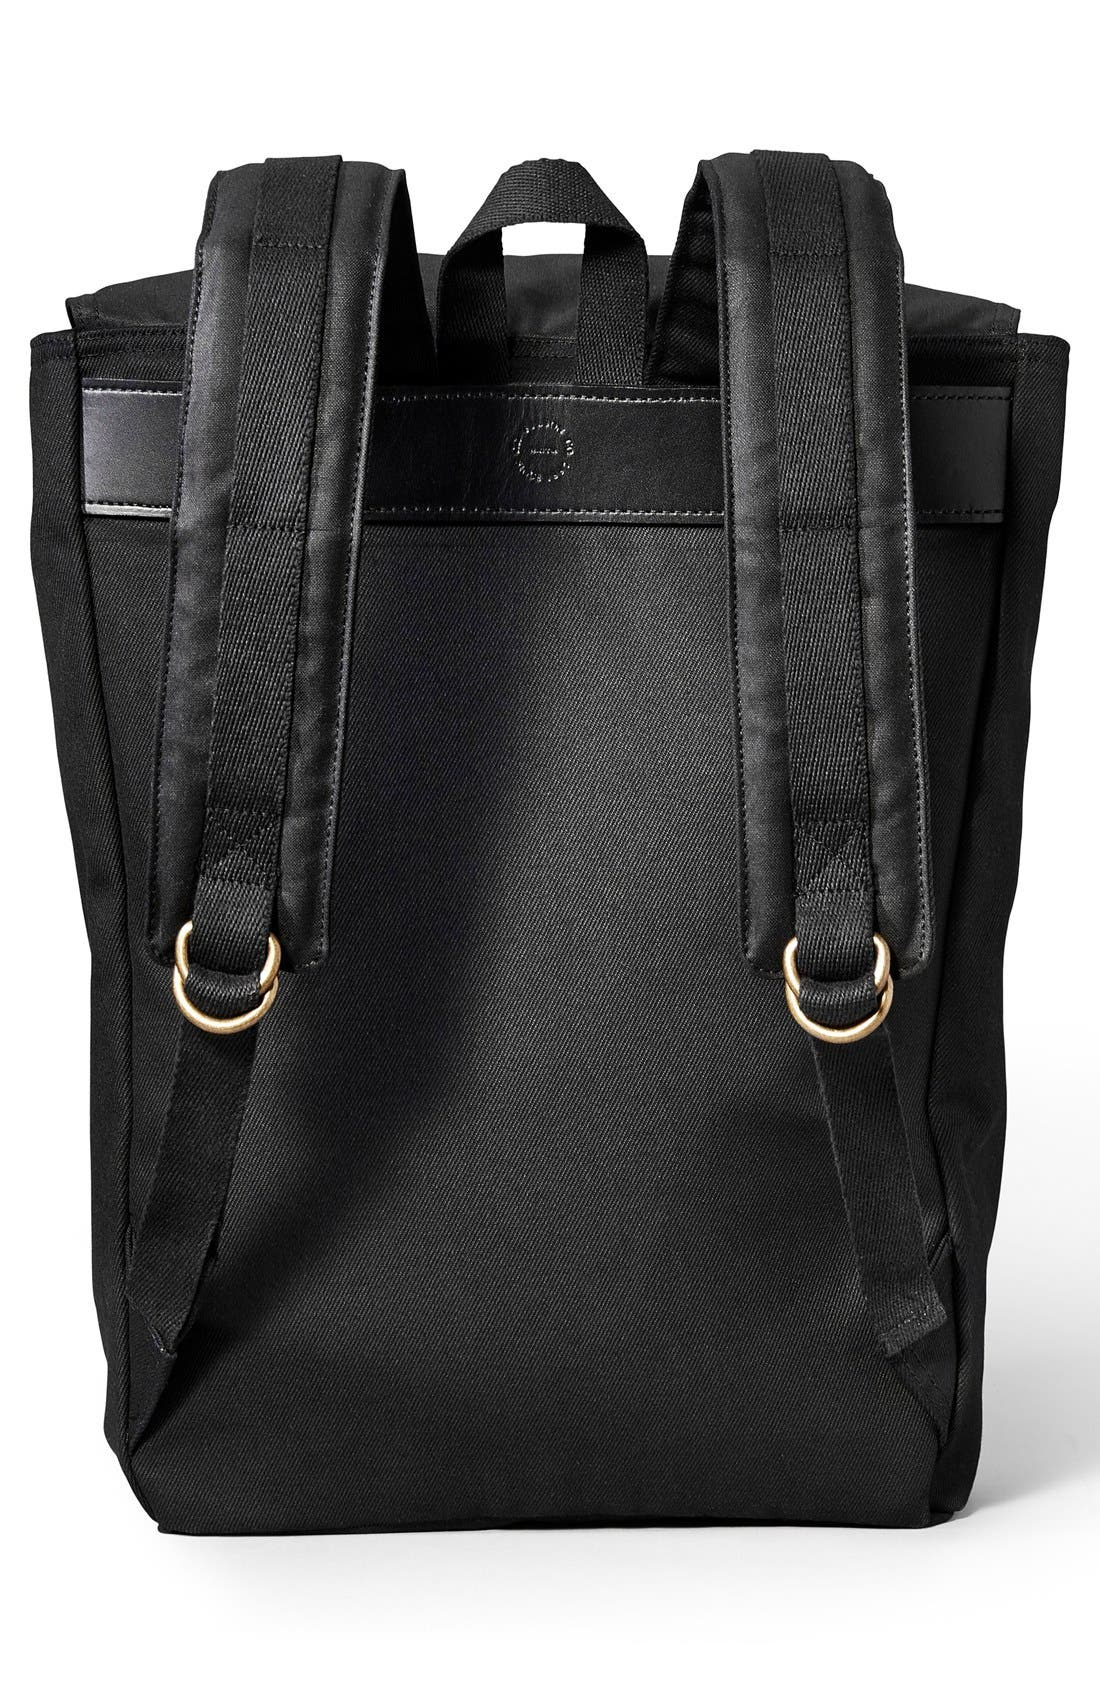 'Ranger' Canvas Backpack,                             Alternate thumbnail 2, color,                             Black